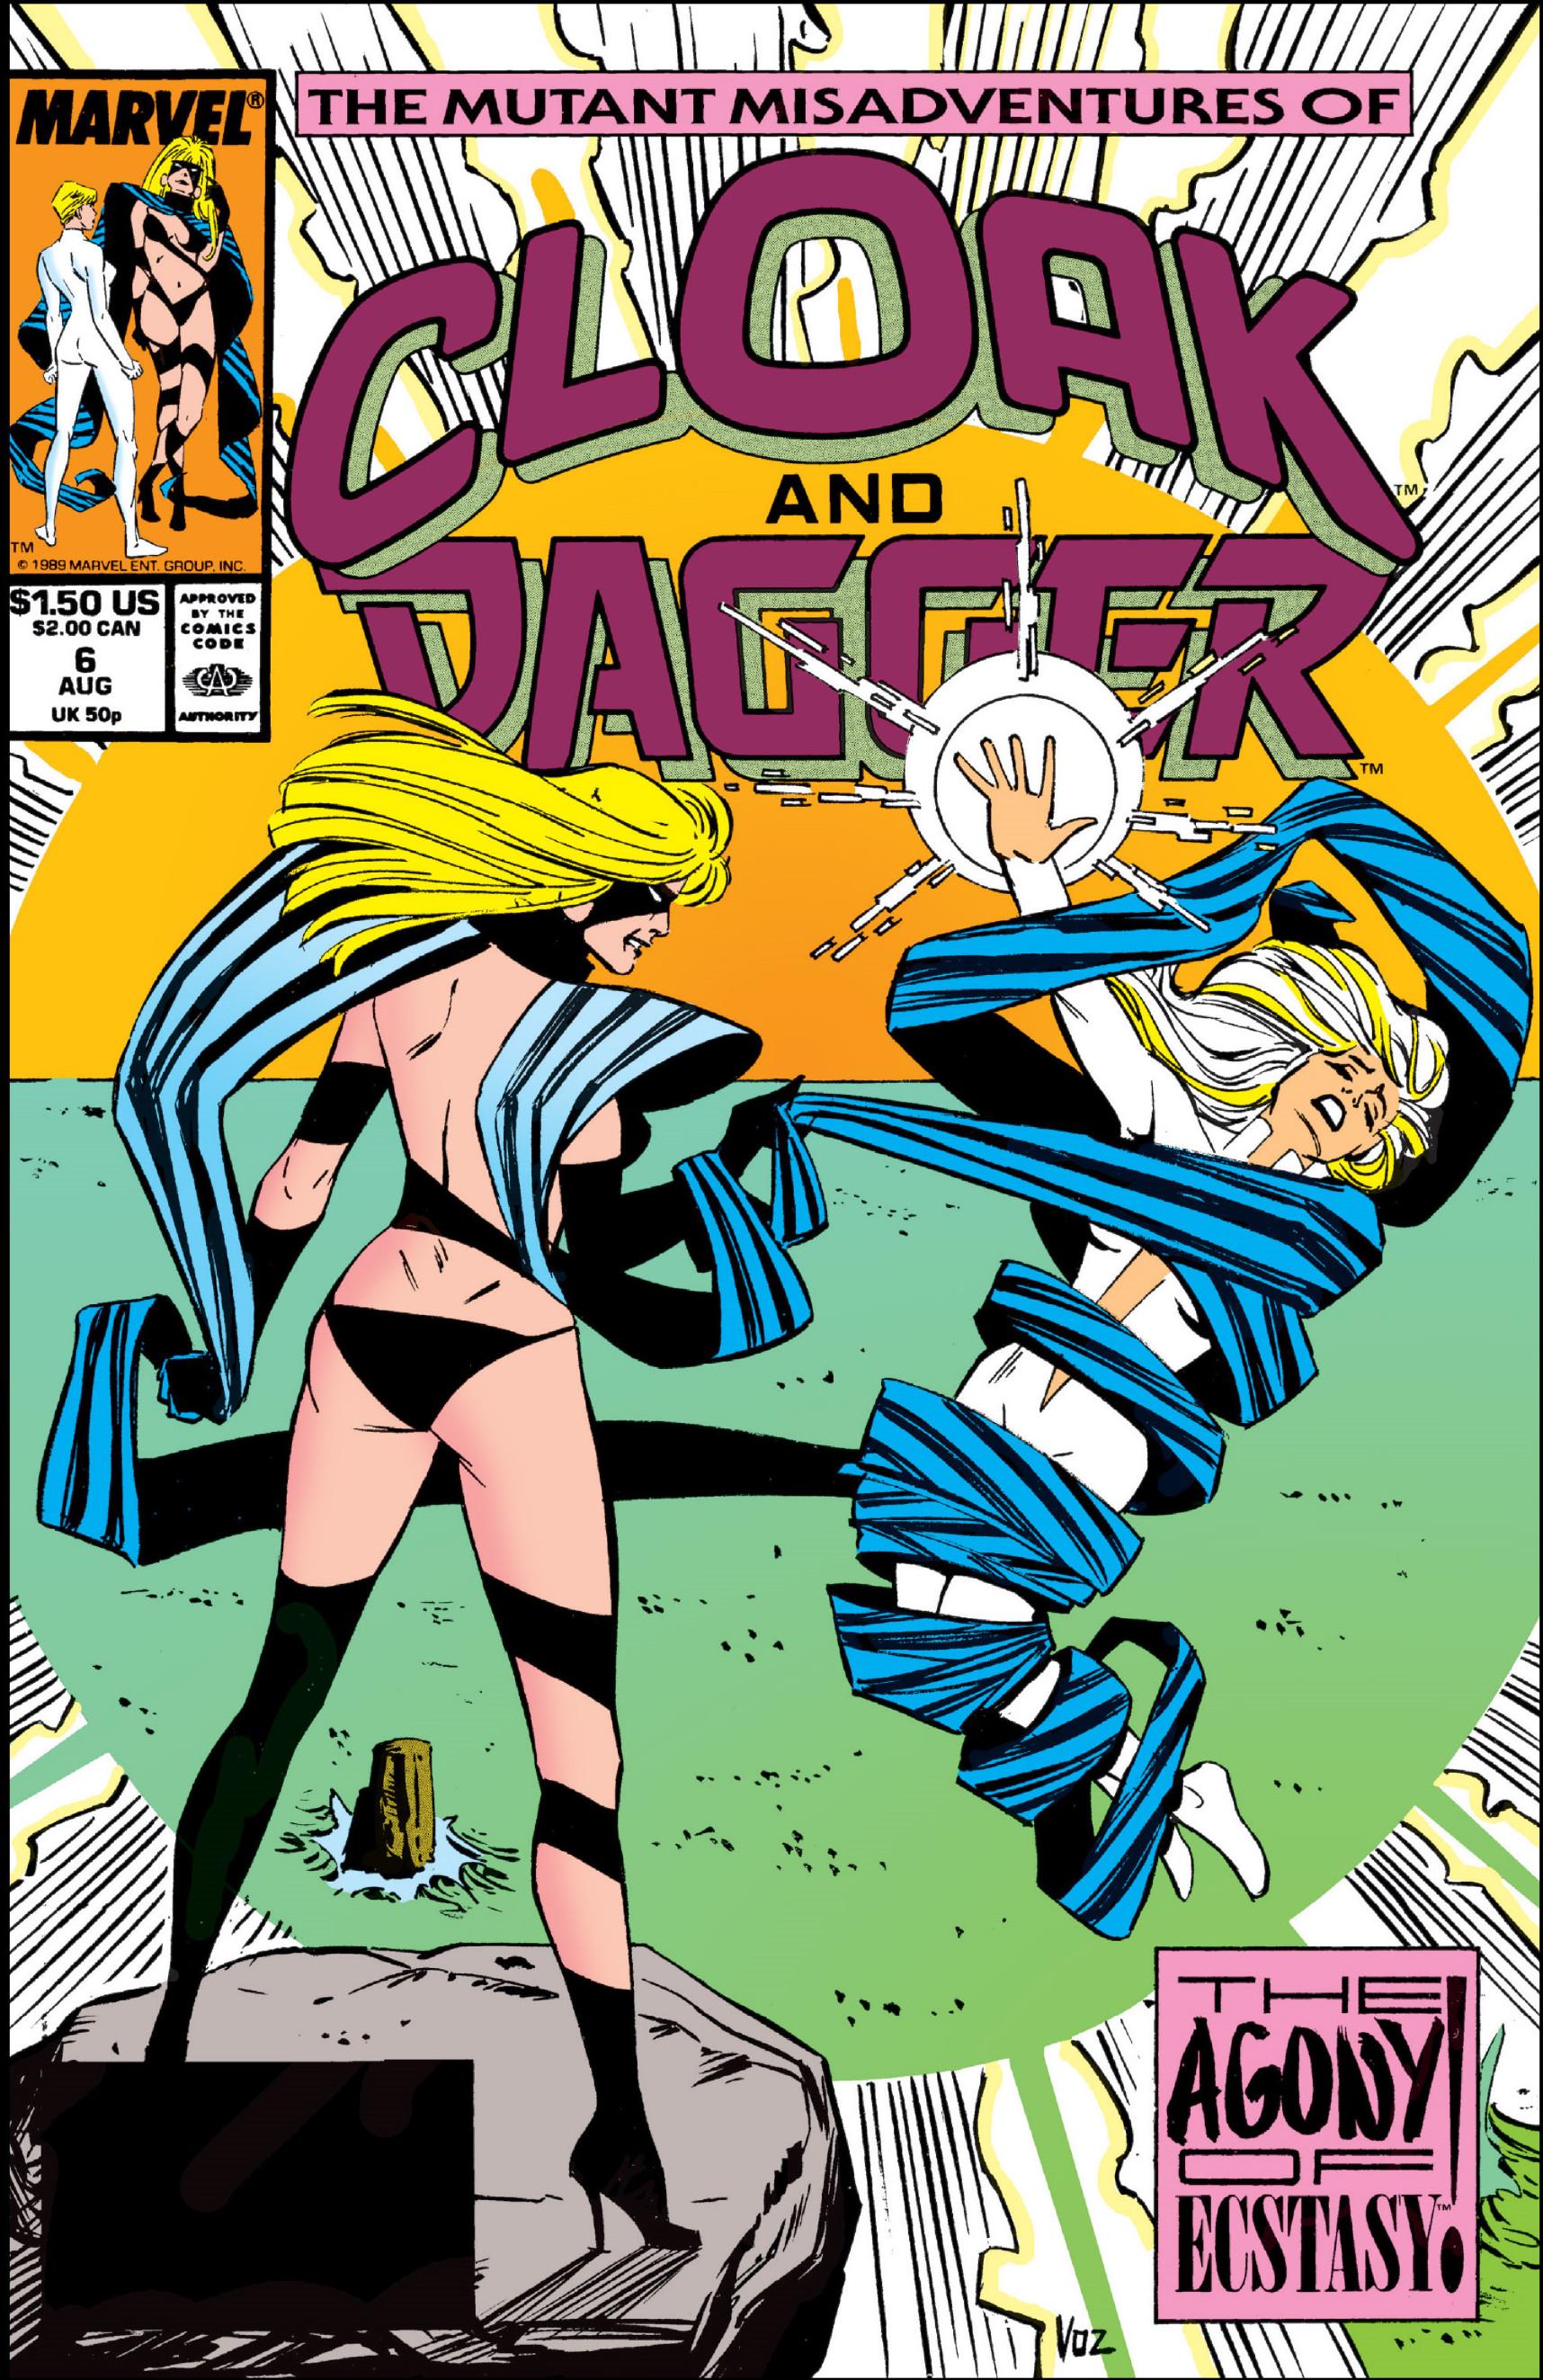 Mutant Misadventures of Cloak and Dagger Vol 1 6